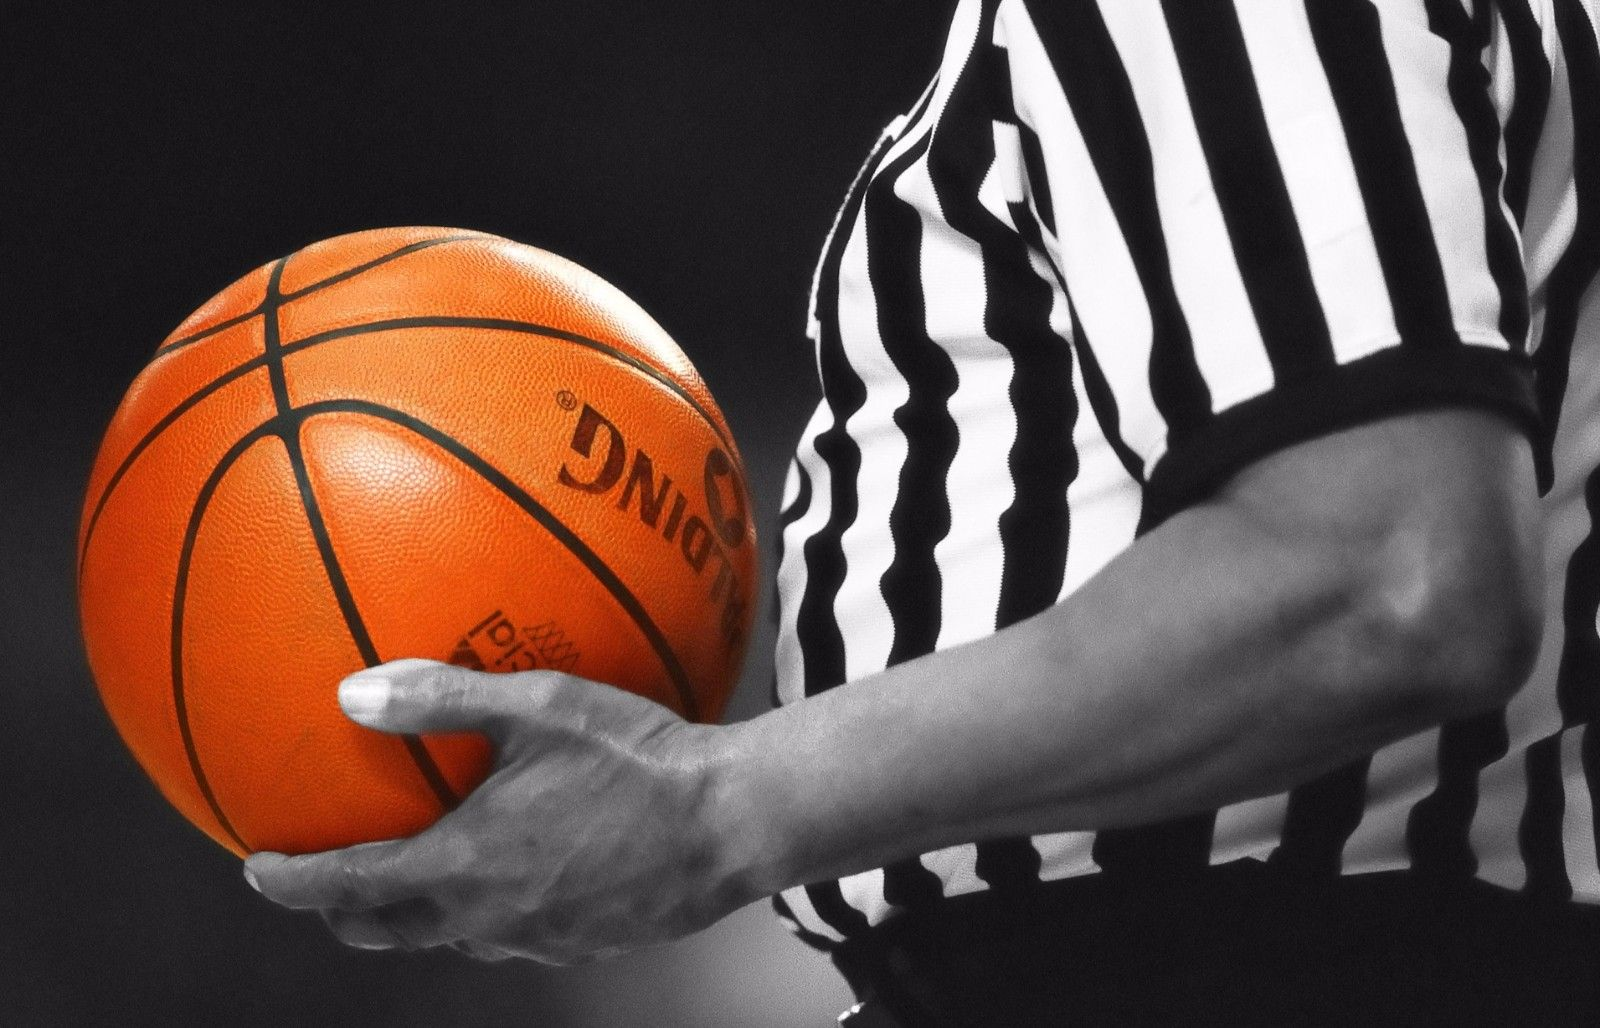 Basketball official